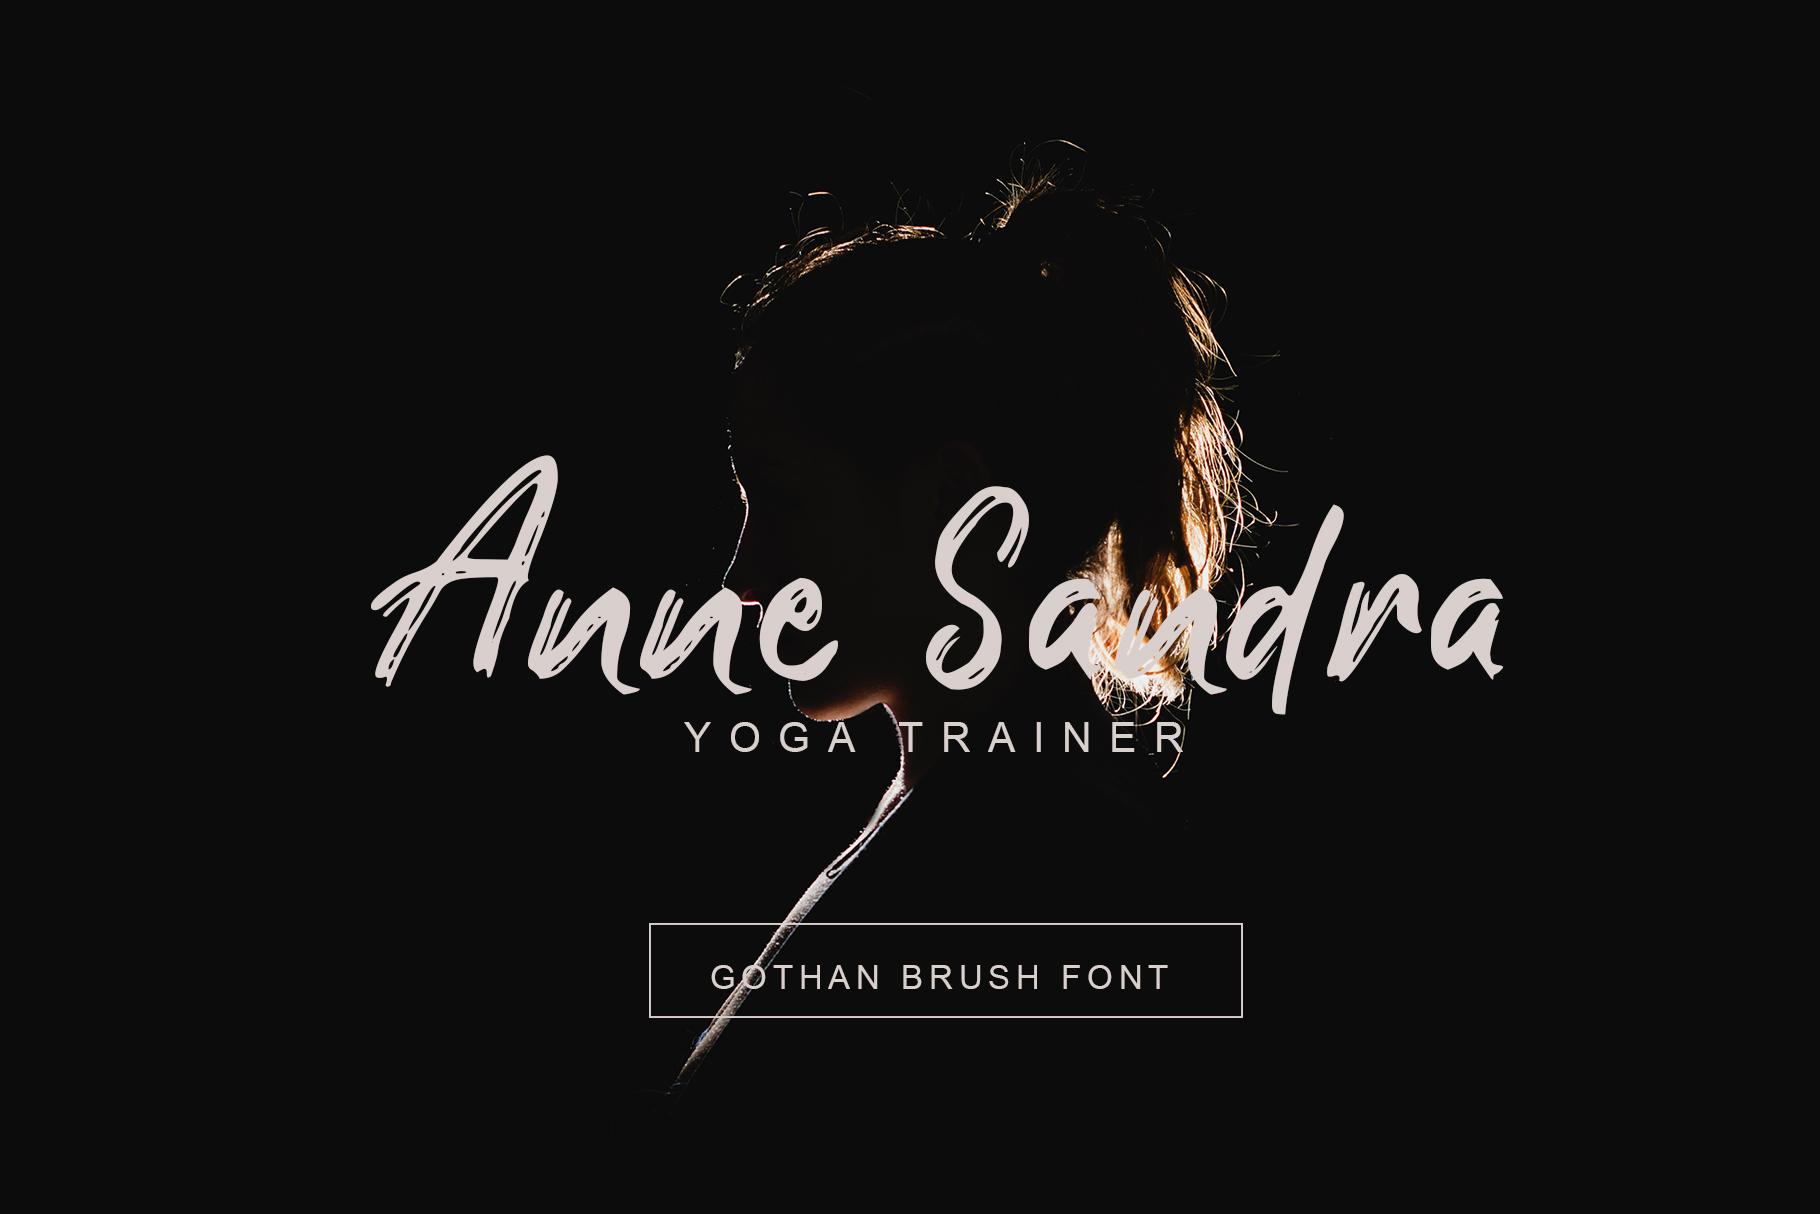 Southen Brush Font example image 6